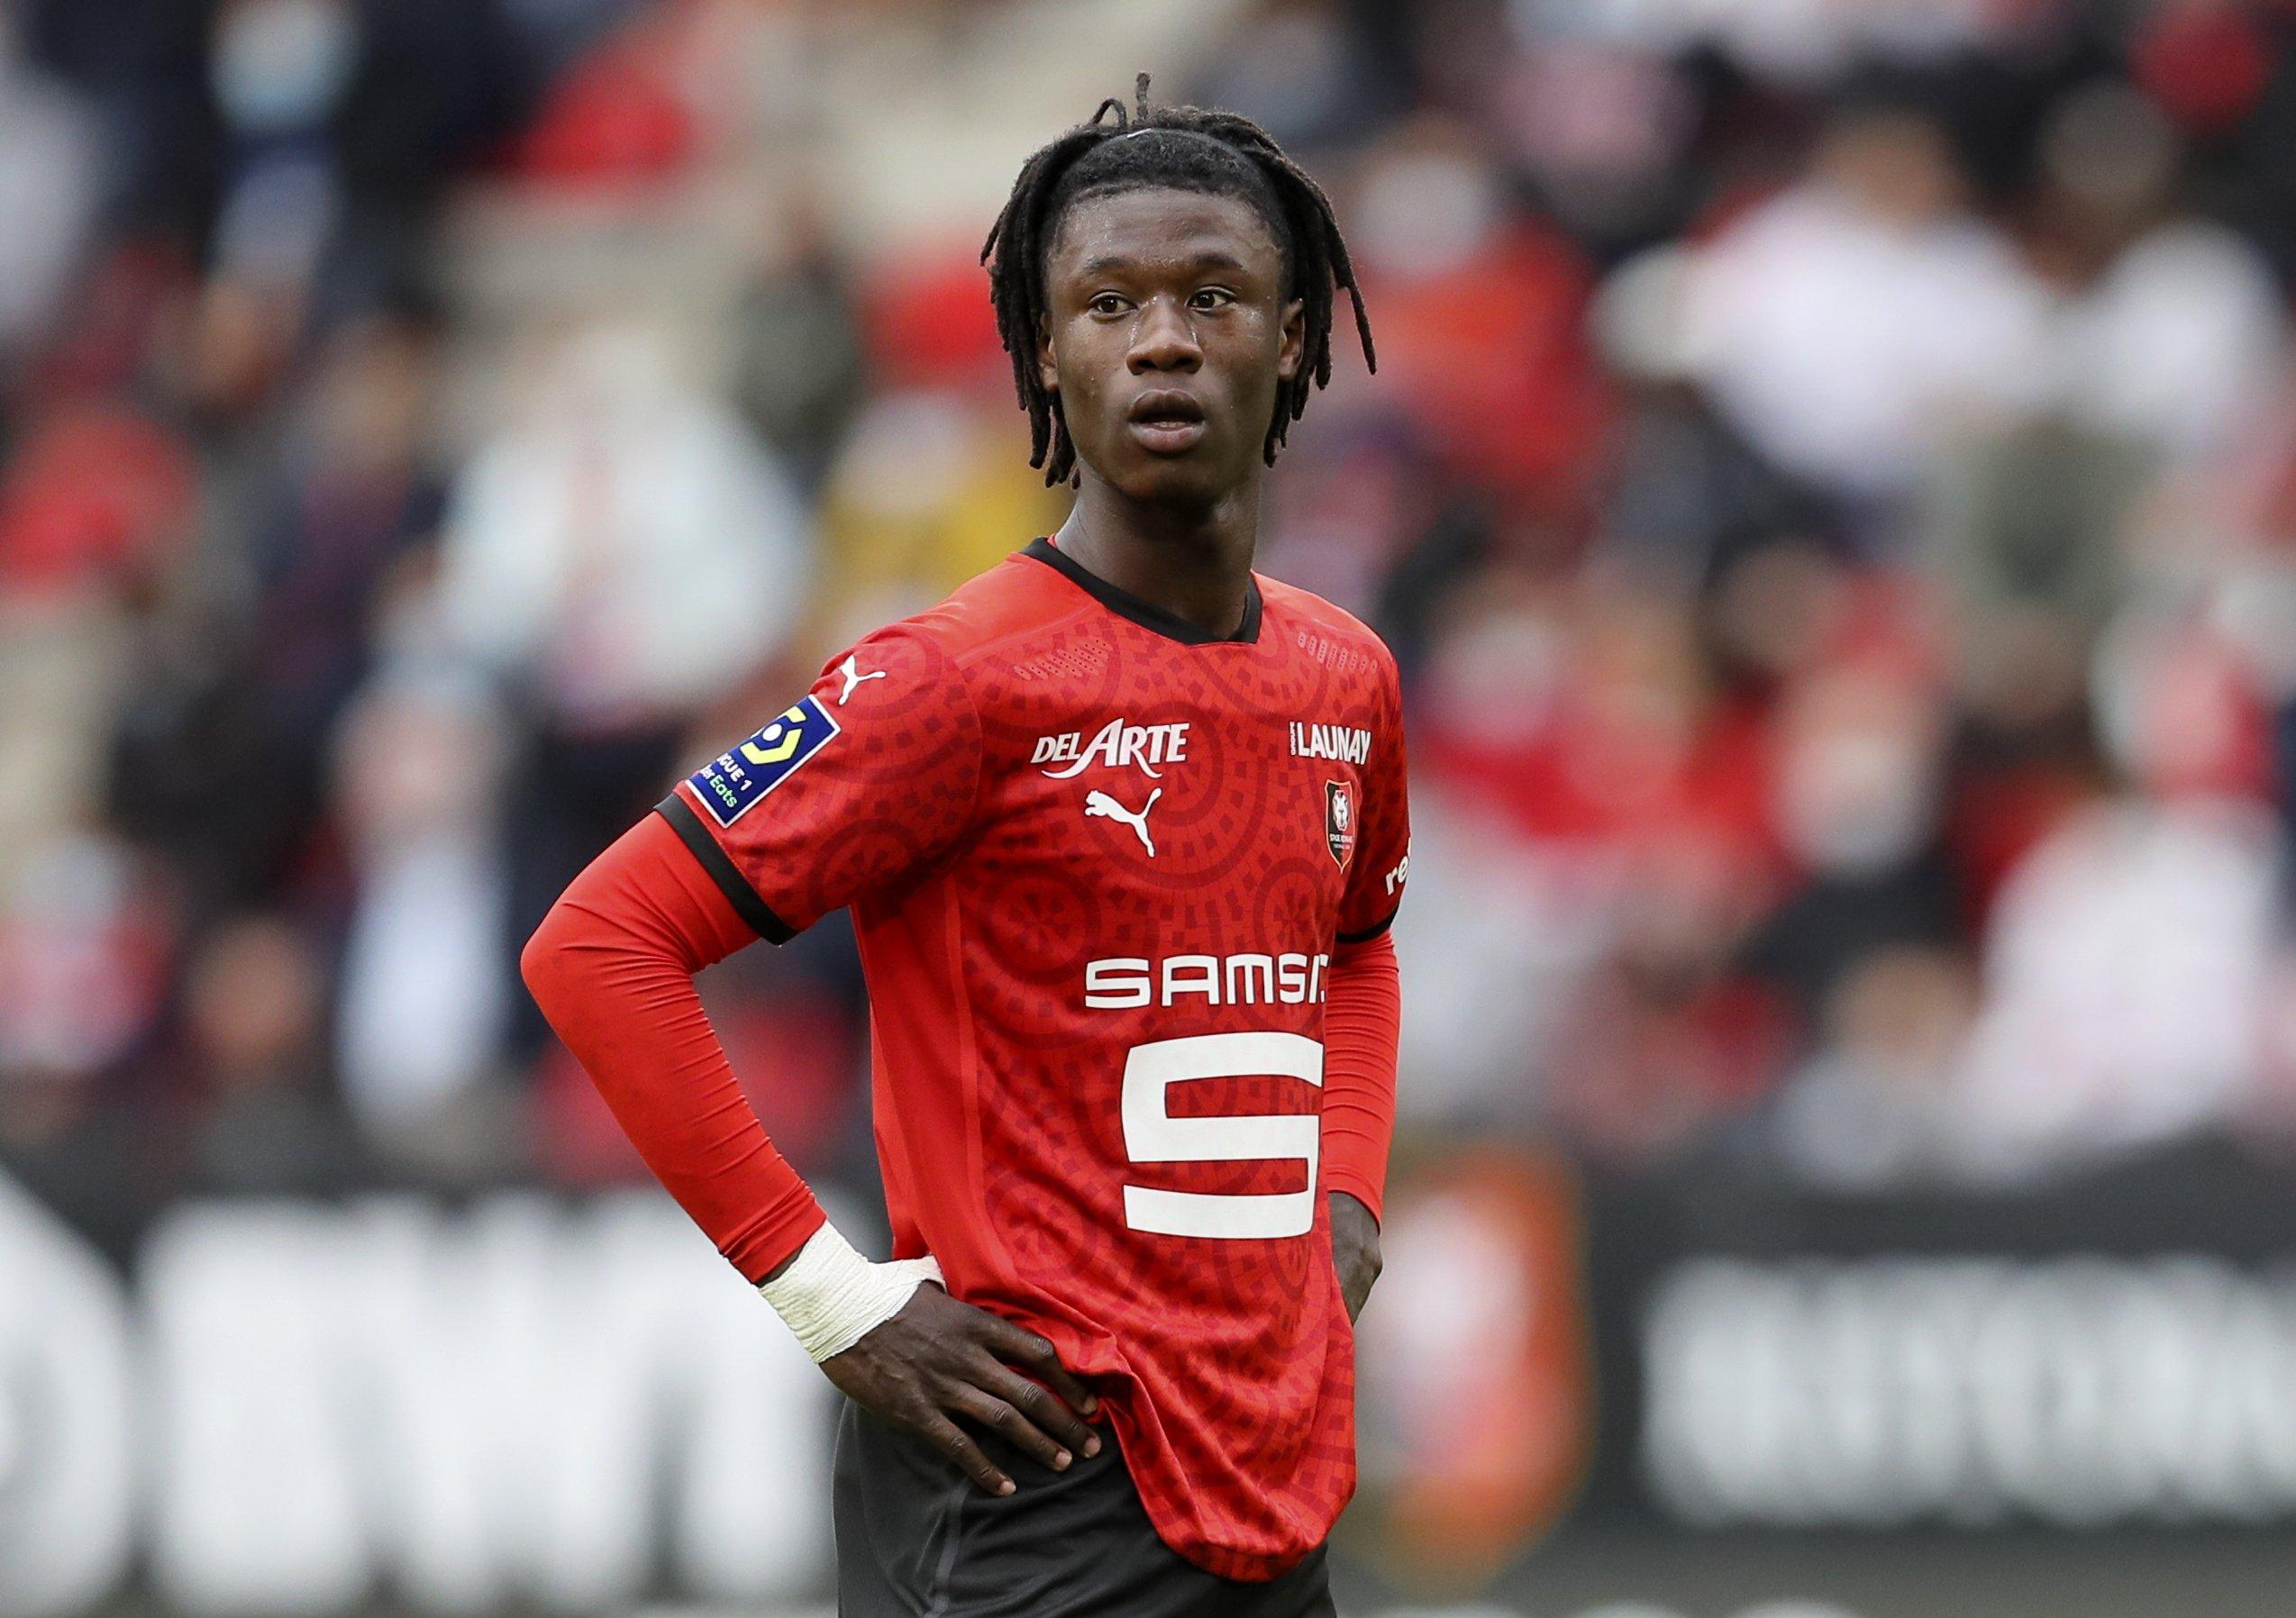 France's next star? Camavinga set for Les Bleus debut at 17